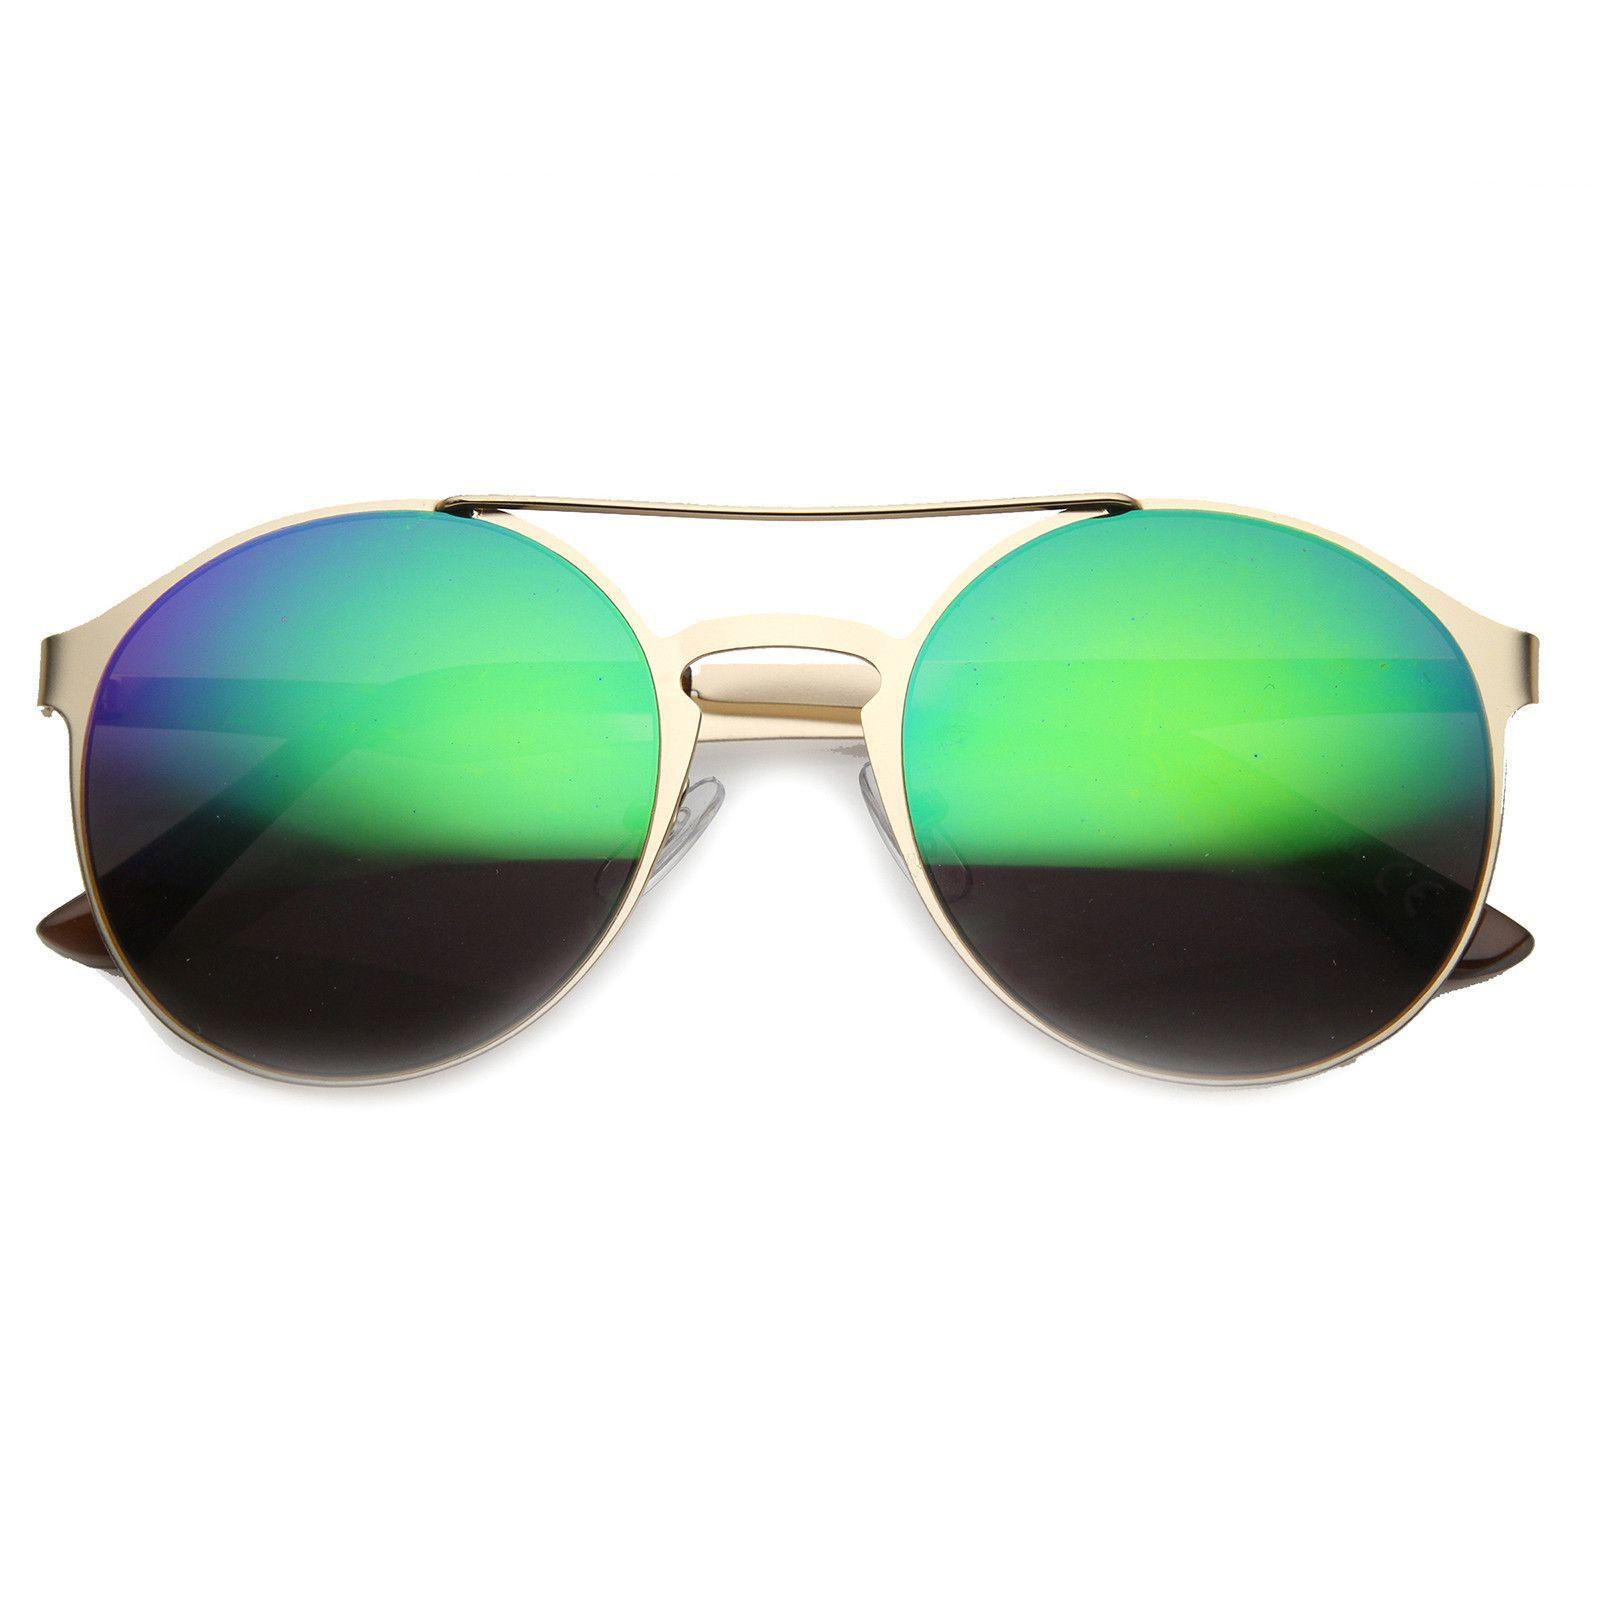 c587bb7d3d26da Retro Fashion Round Metal Crossbar Revo Lens Sunglasses 9819 - zeroUV